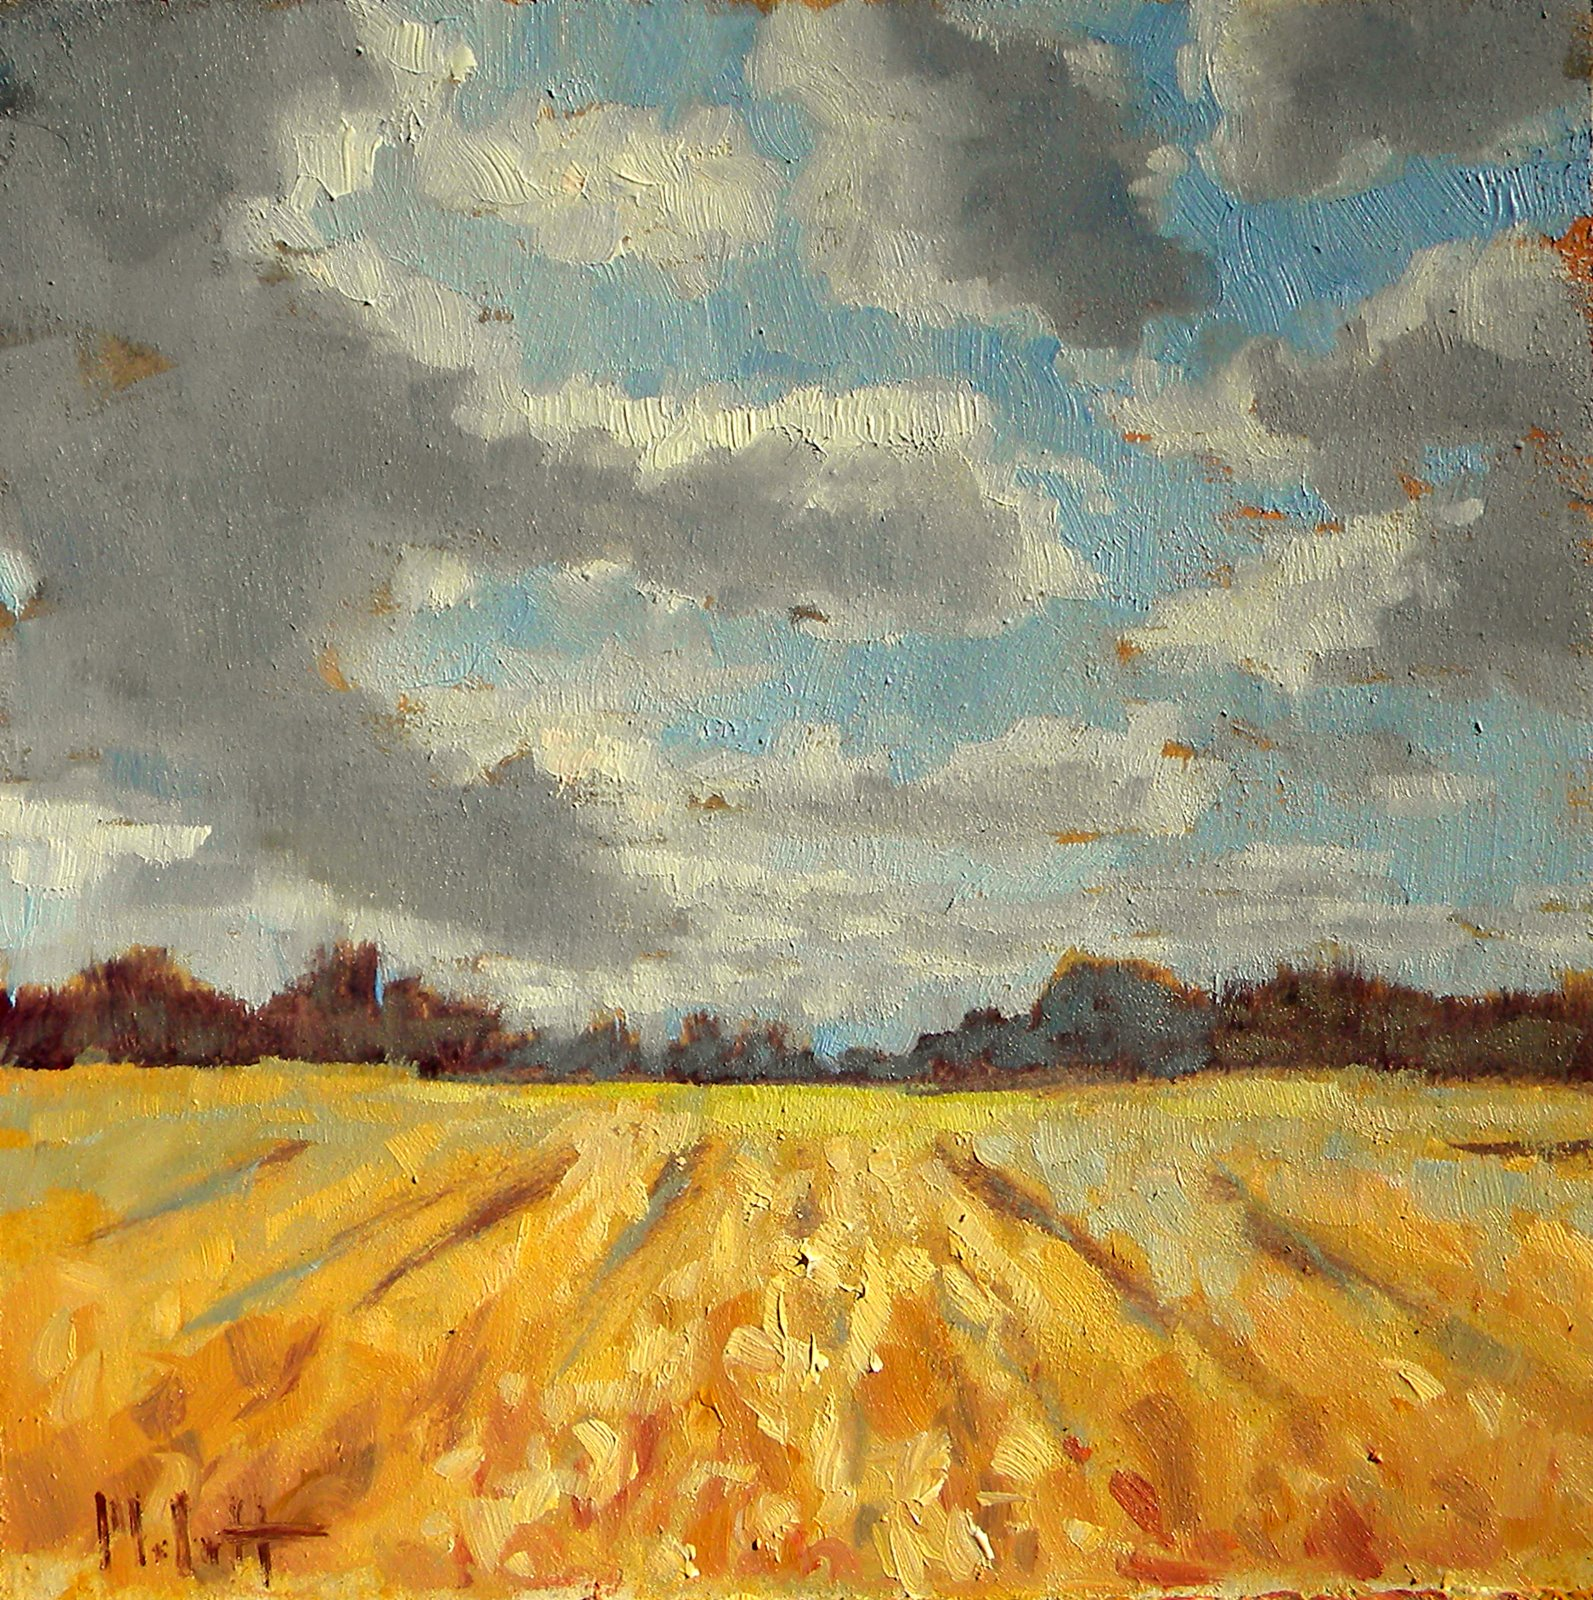 Painting: Painting Daily Heidi Malott Original Art: September 2010